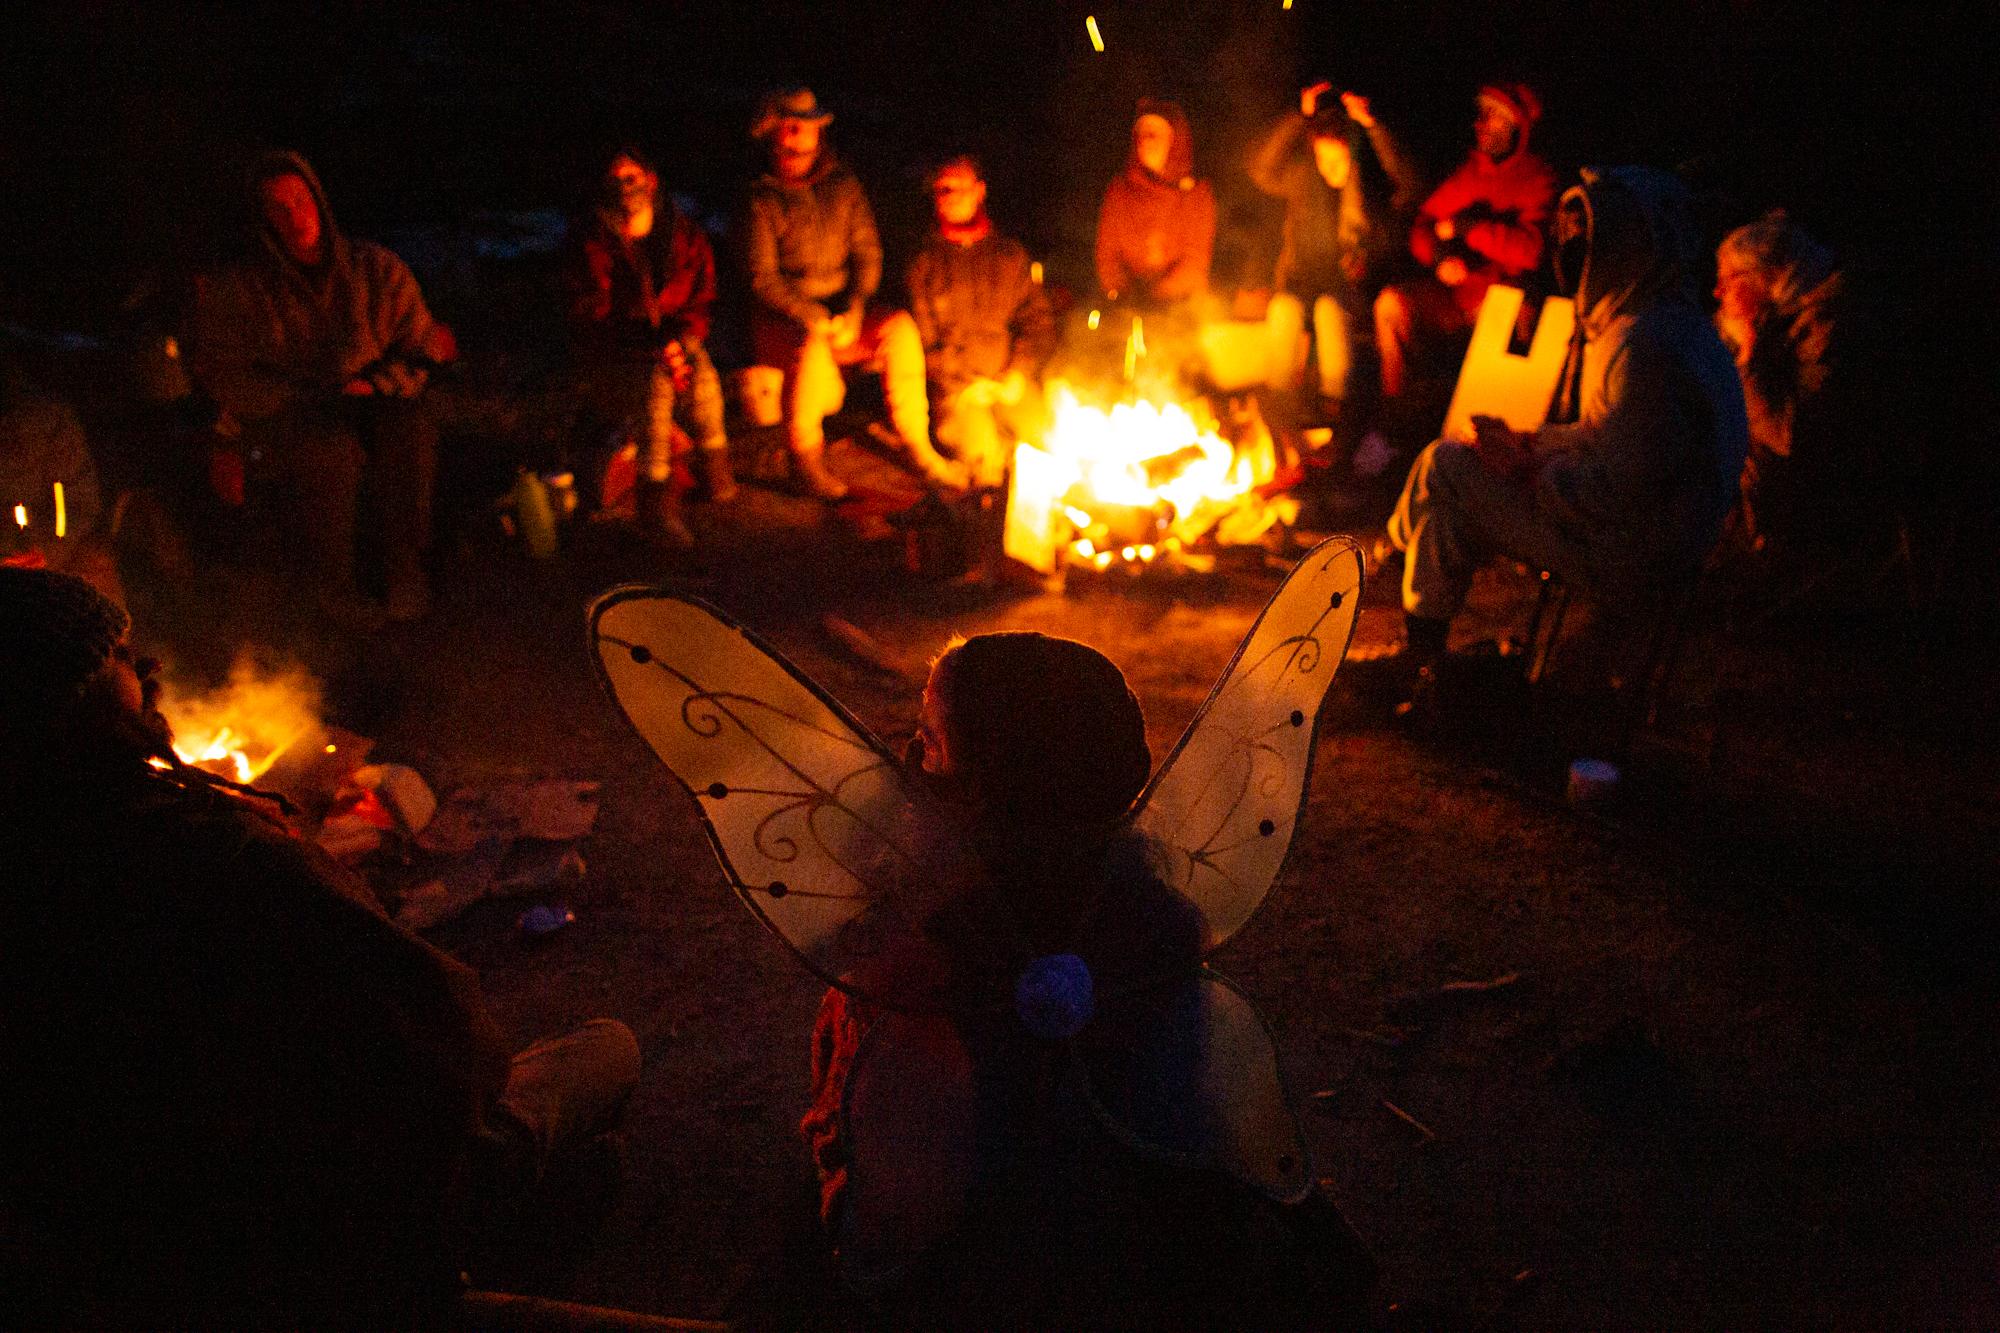 Fairy Creek blockaders sit around a campfire at night